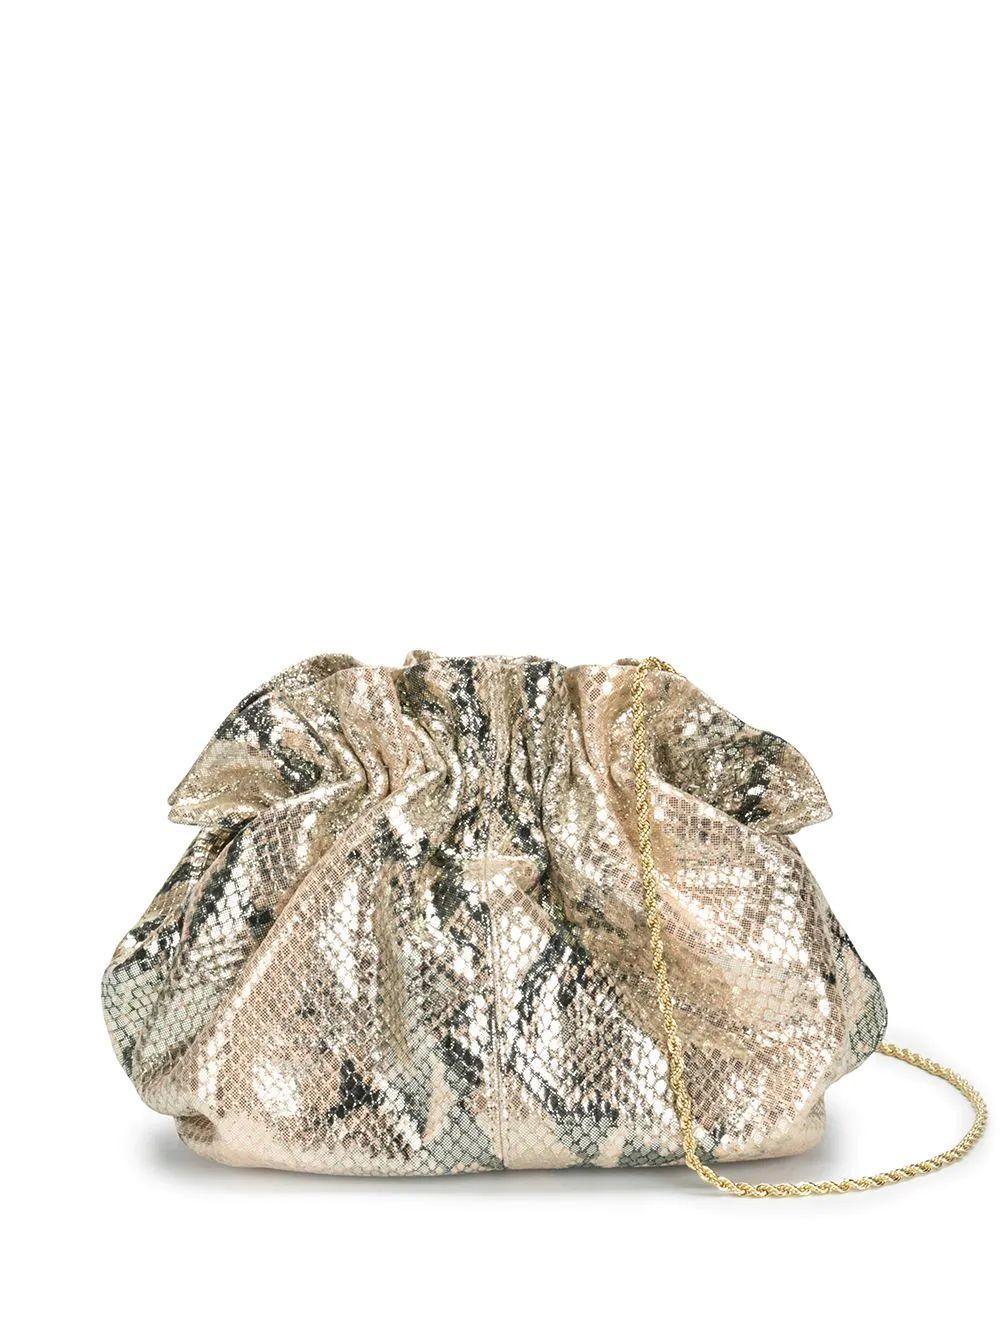 Willa Disco Embossed Snake Bag Item # WILLA-EMSK